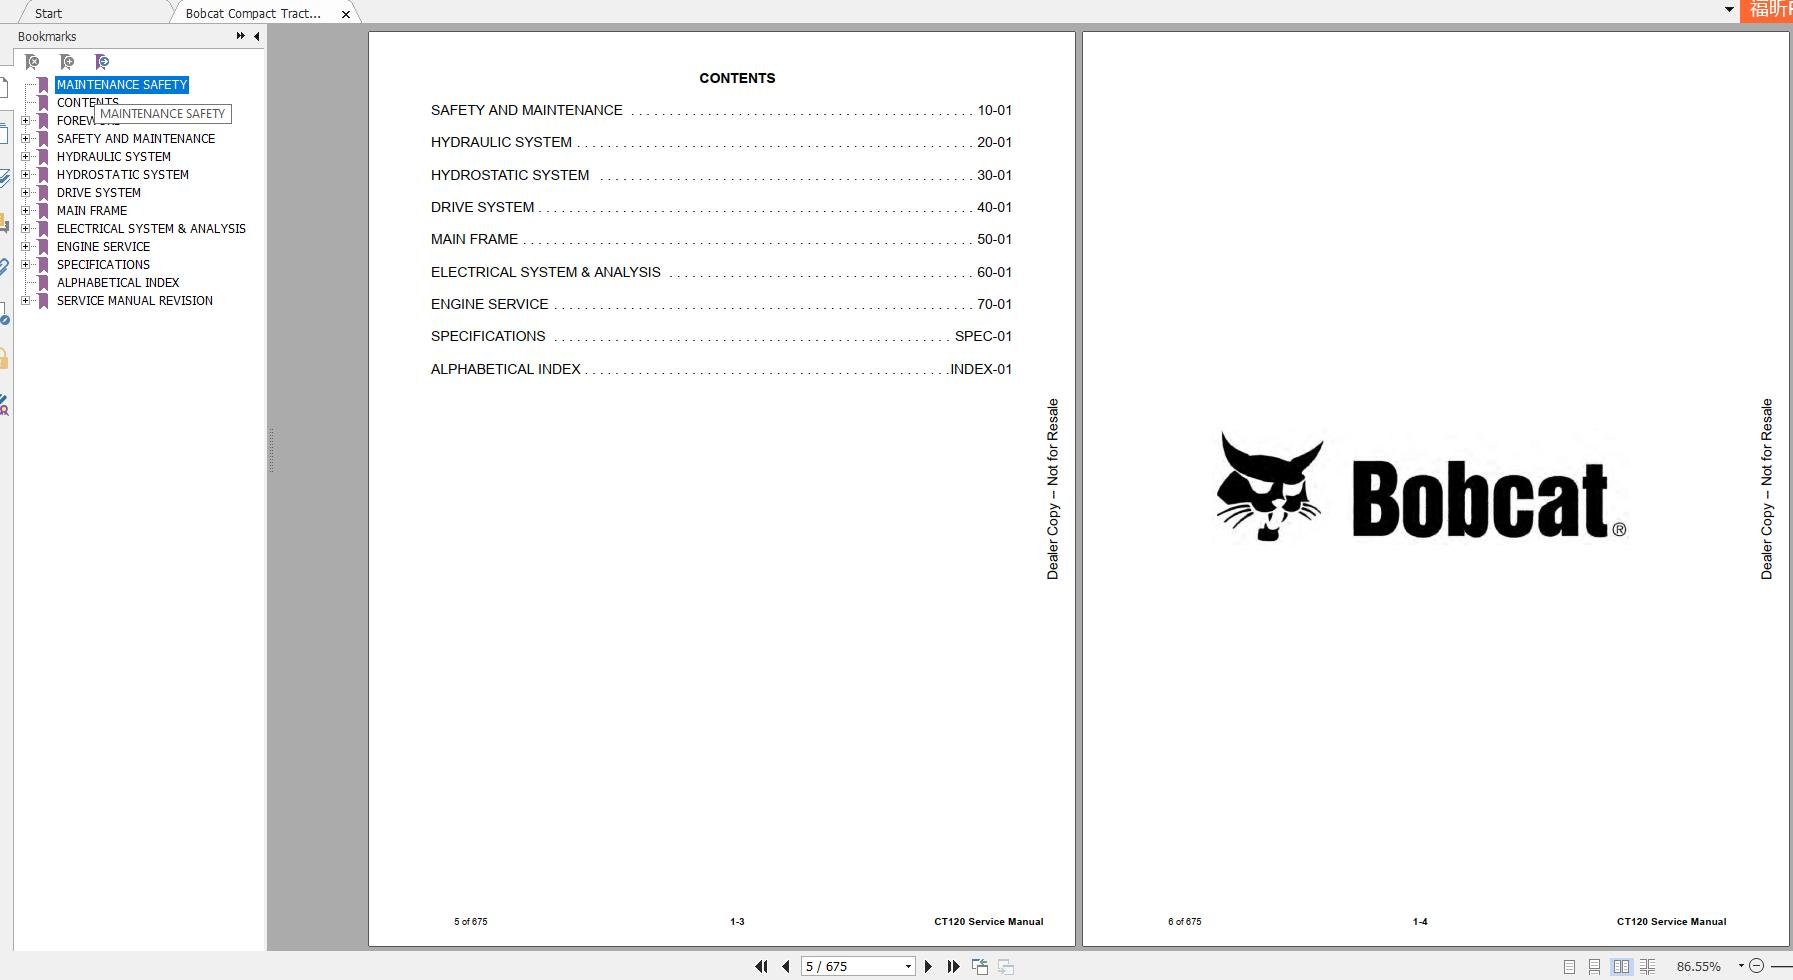 Bobcat Compact Tractor Ct120 Service Manual 6986523